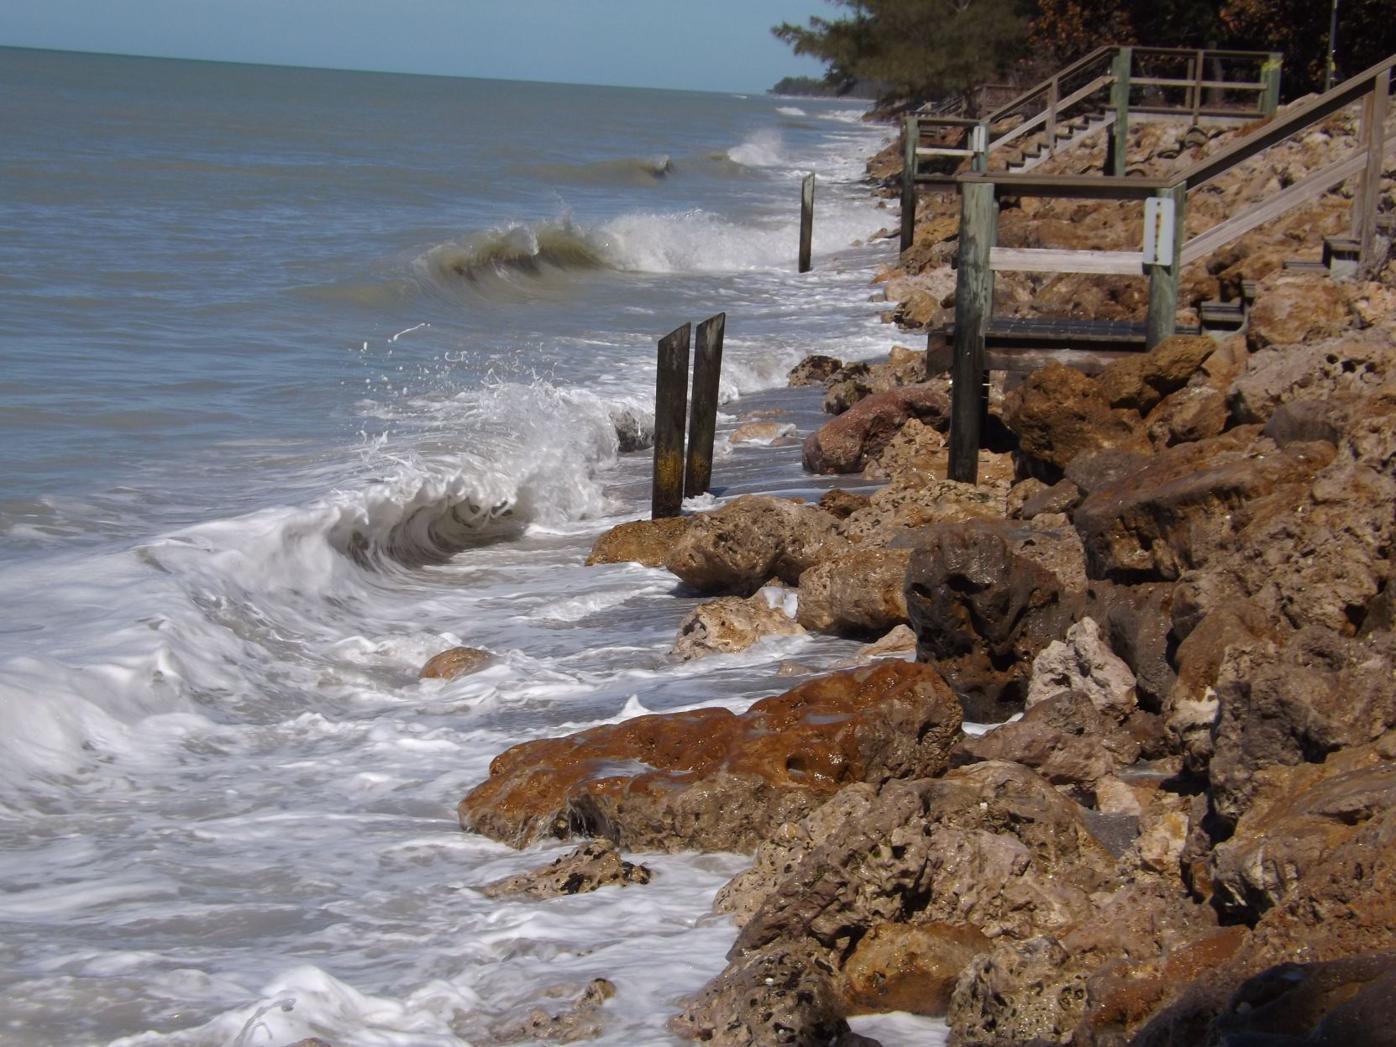 Manasota Key rebuild could start soon | Venice Gondolier ...